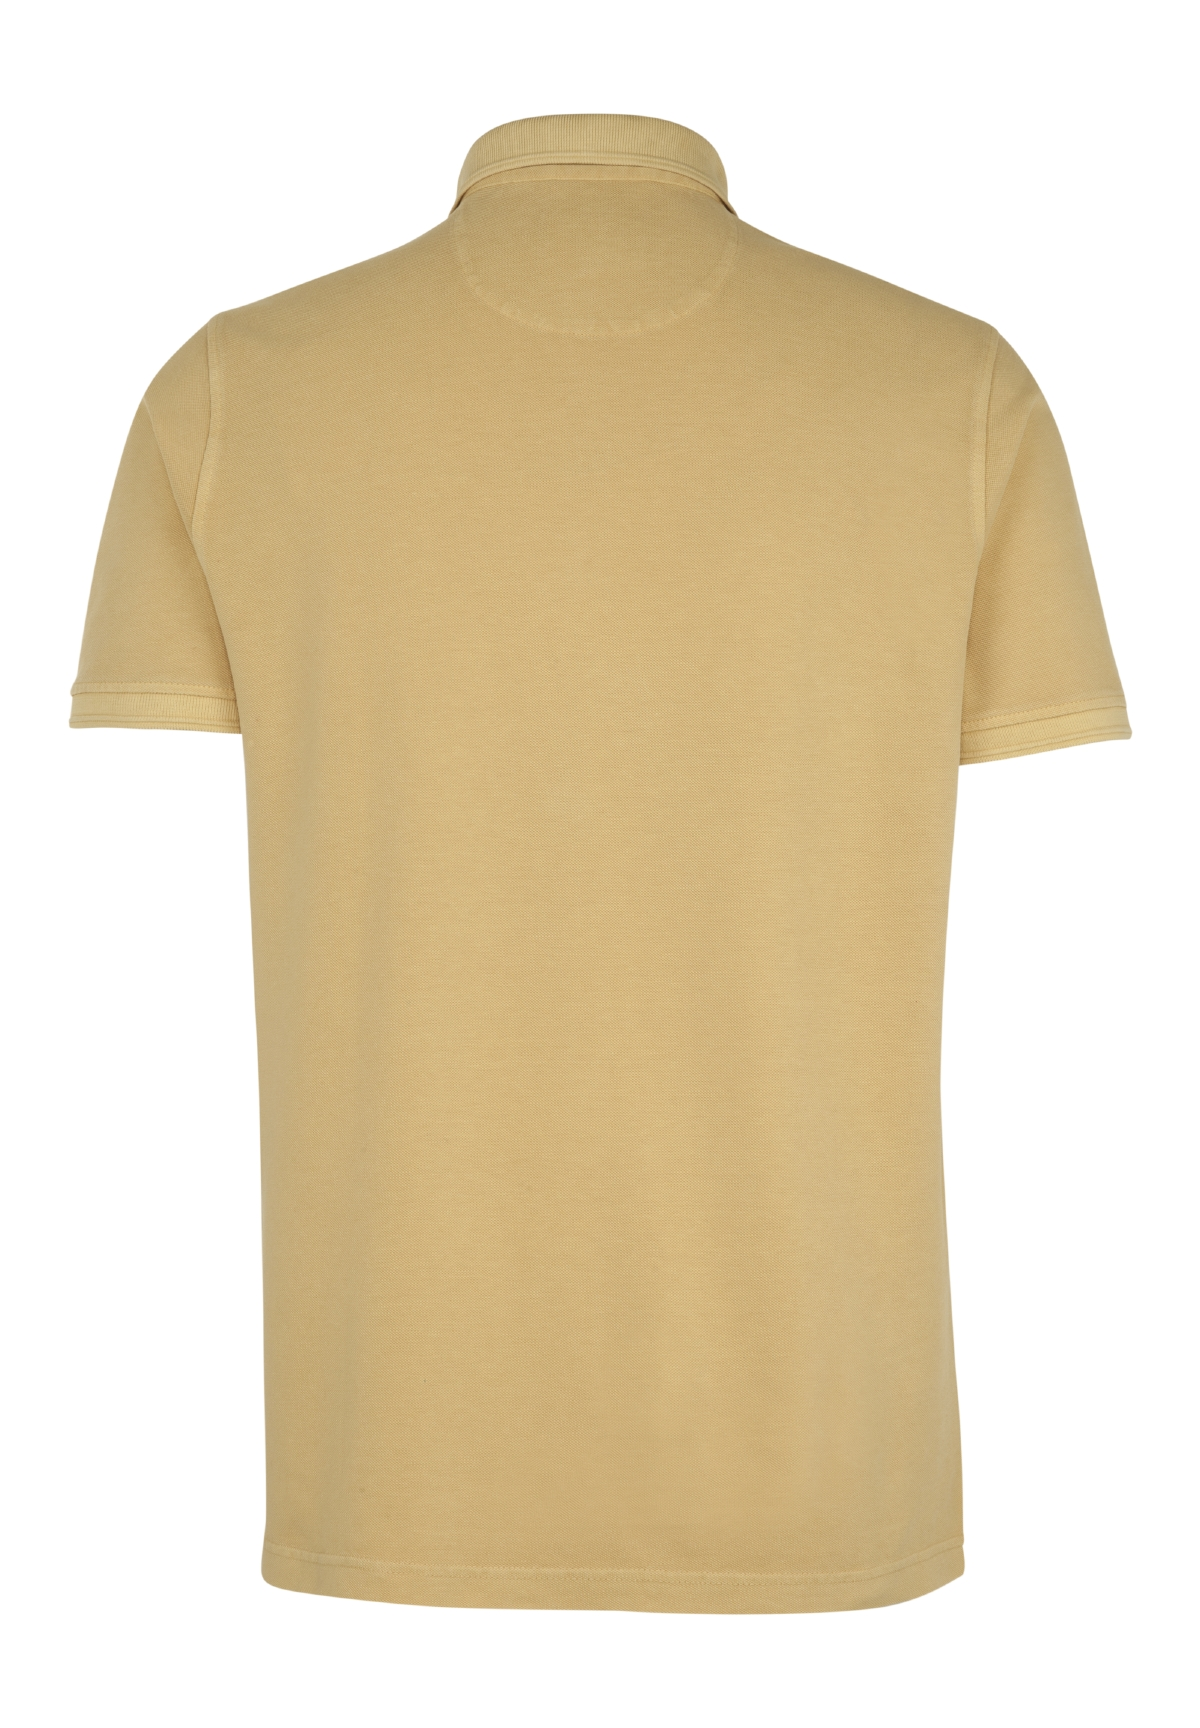 Camel-Active-Herren-Shirt-Poloshirt-Pique-Regular-Fit-NEU Indexbild 73